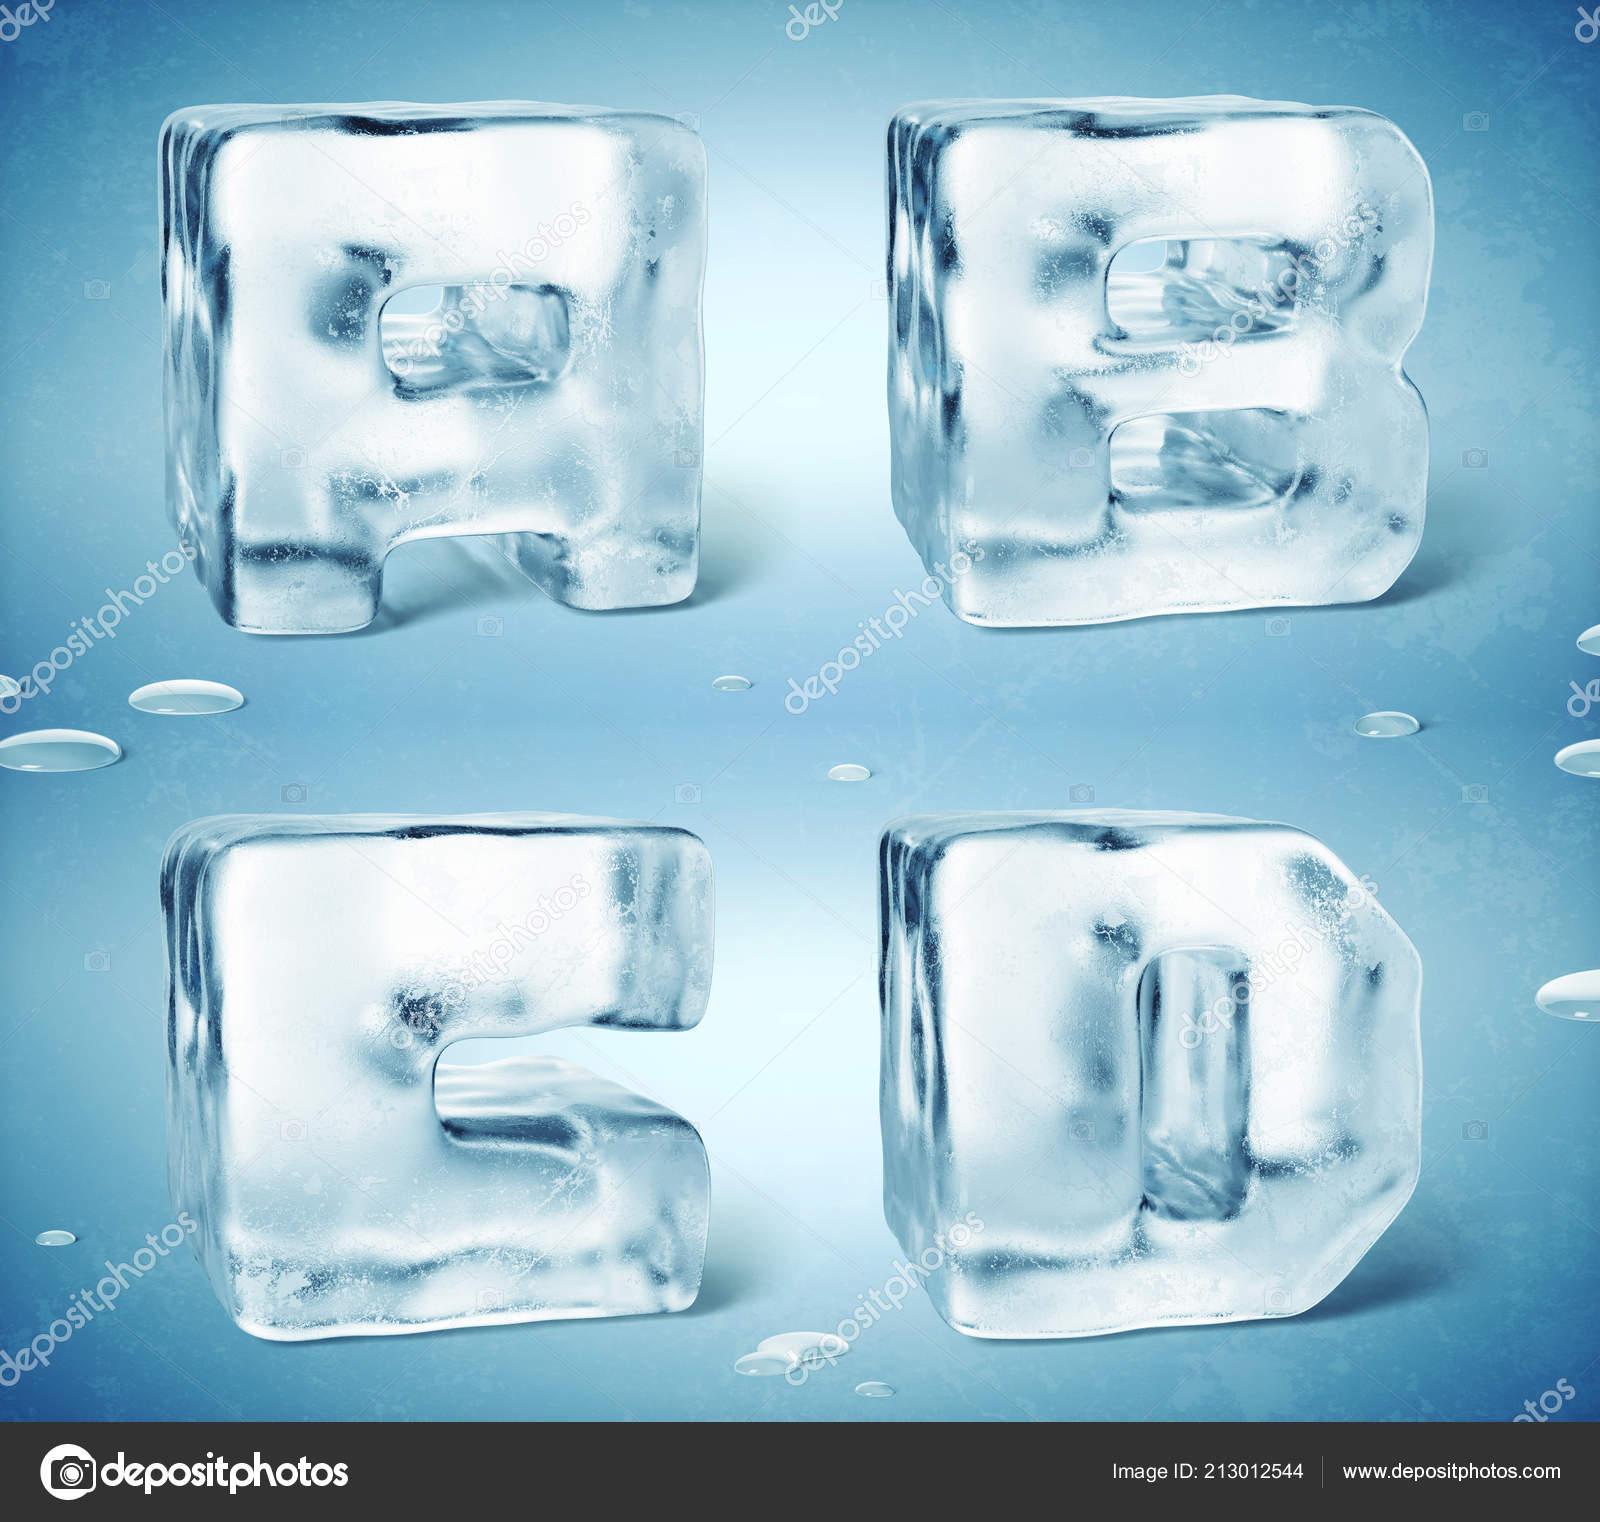 3d Render Of Shiny Frozen Ice Cube Letters Photo By Gleb Guralnyk